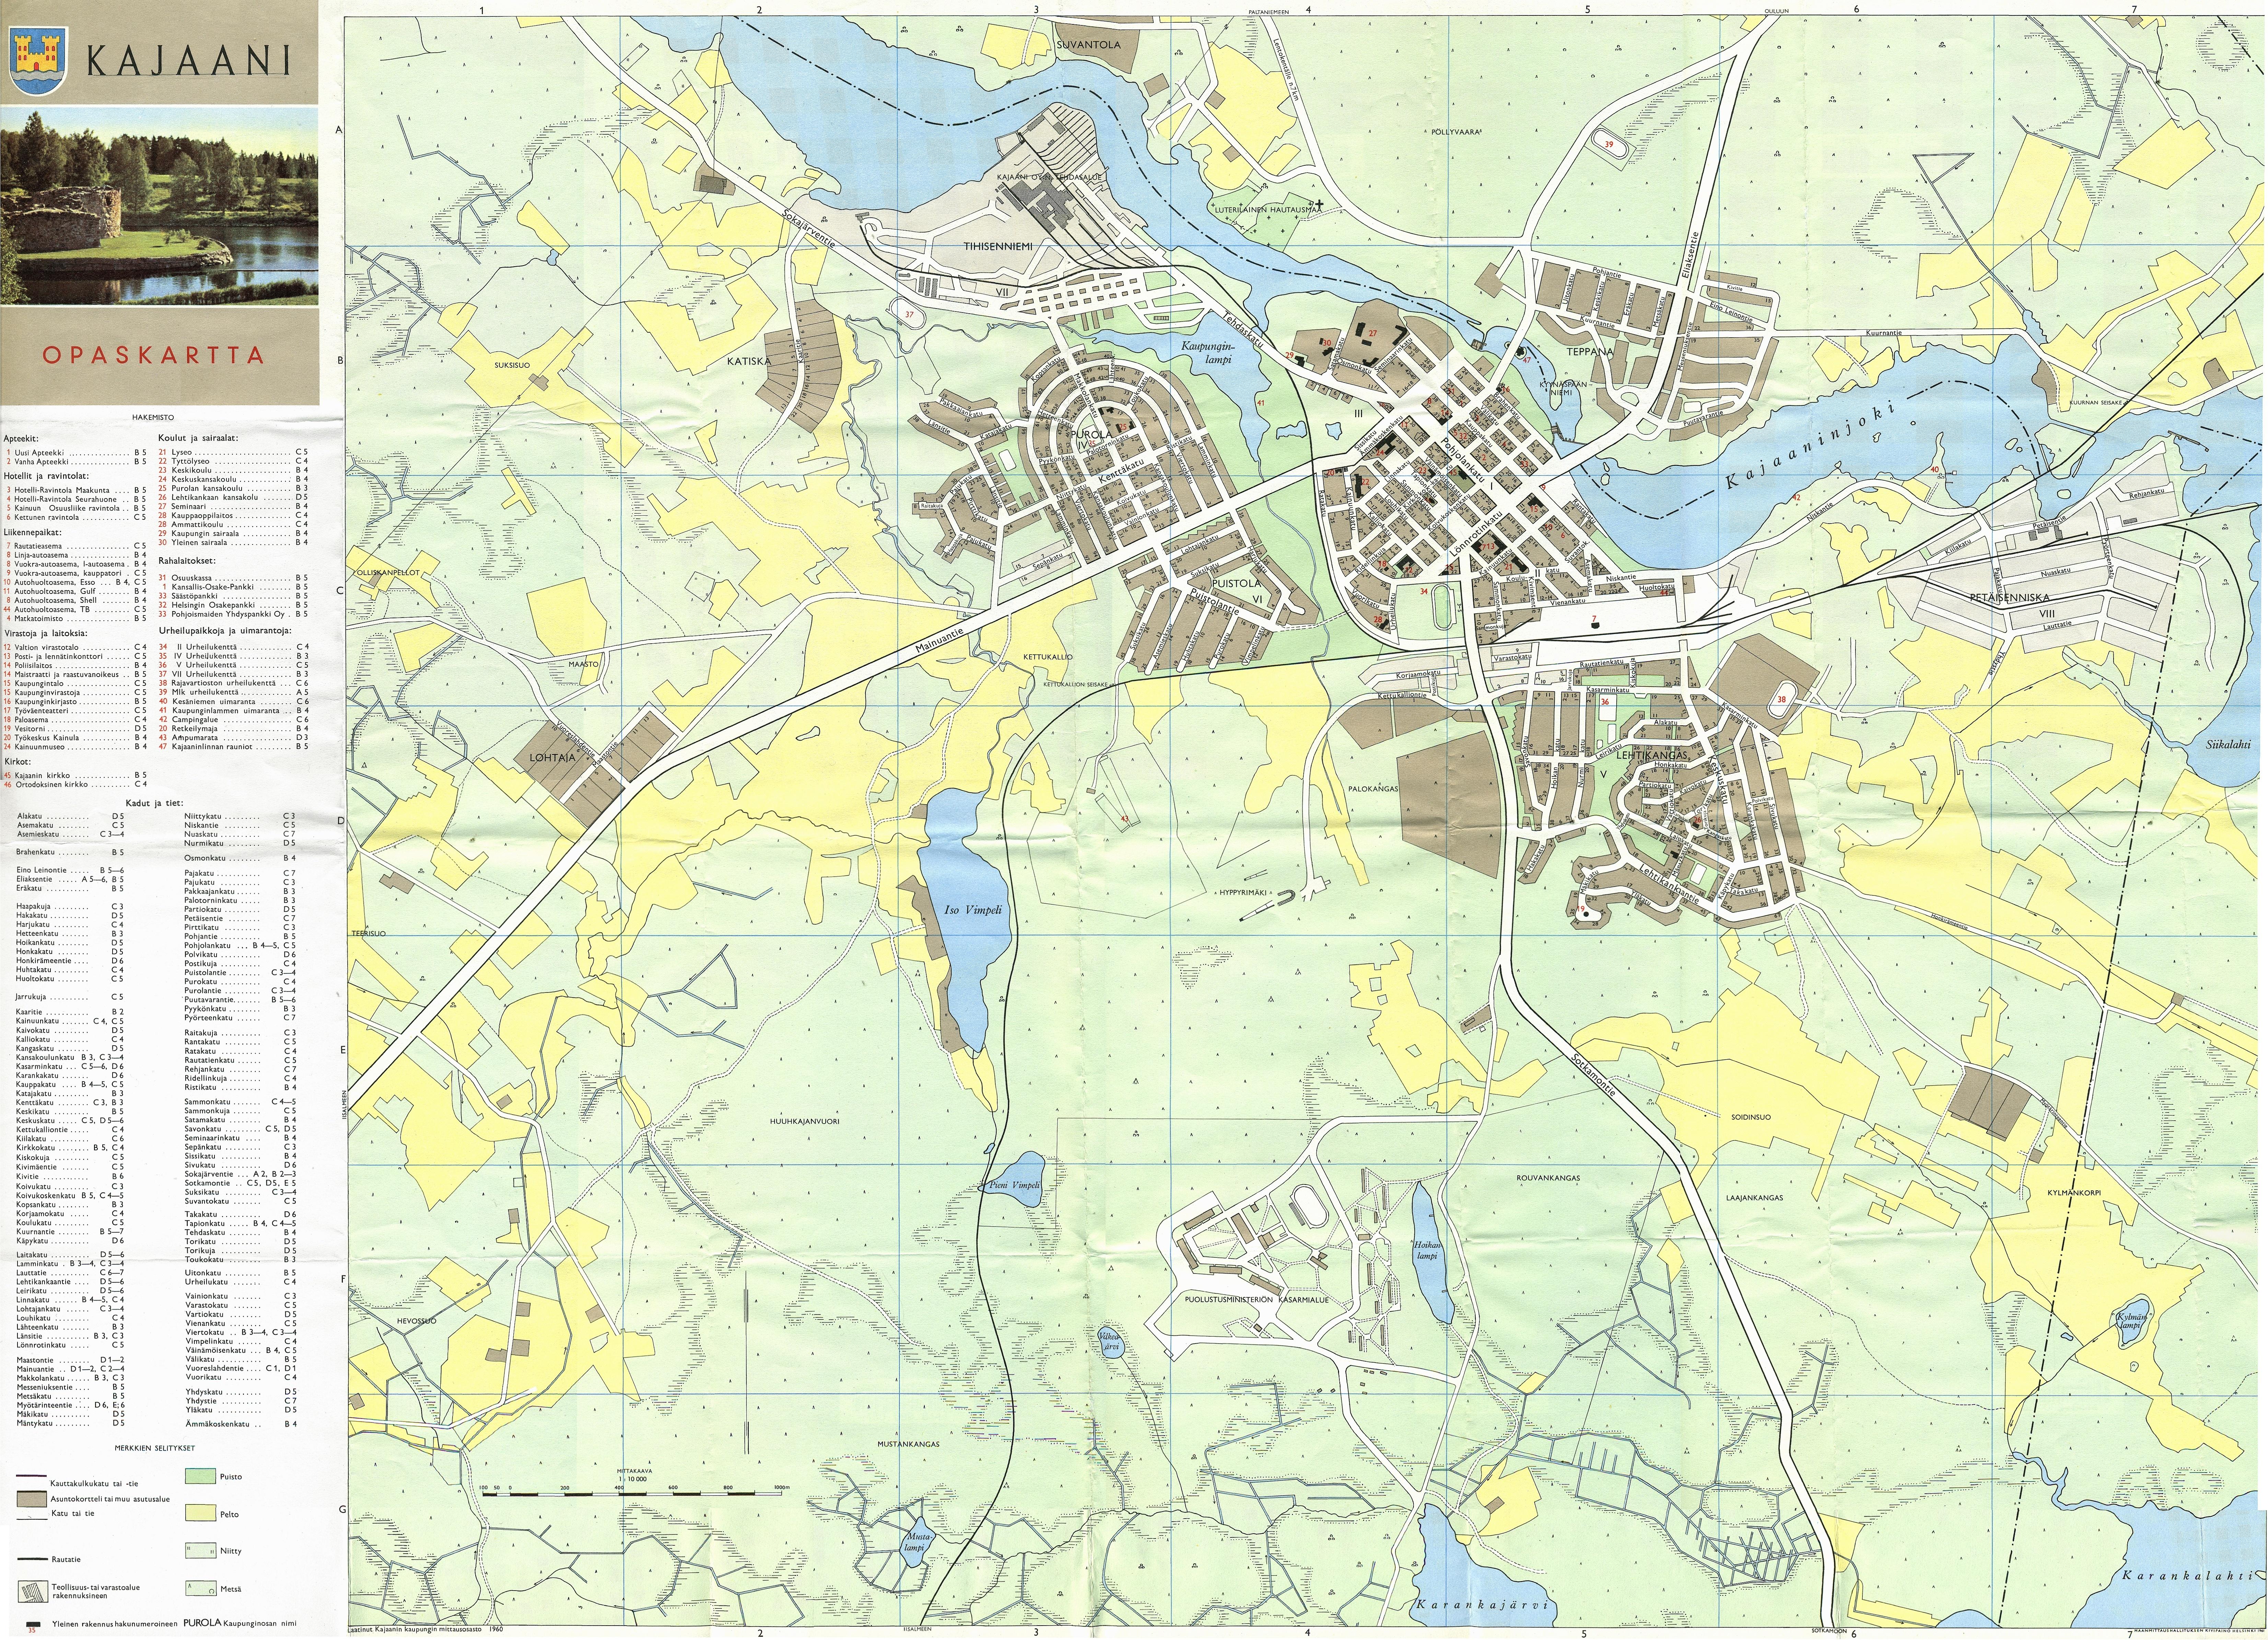 Lappeenranta kartta 1960